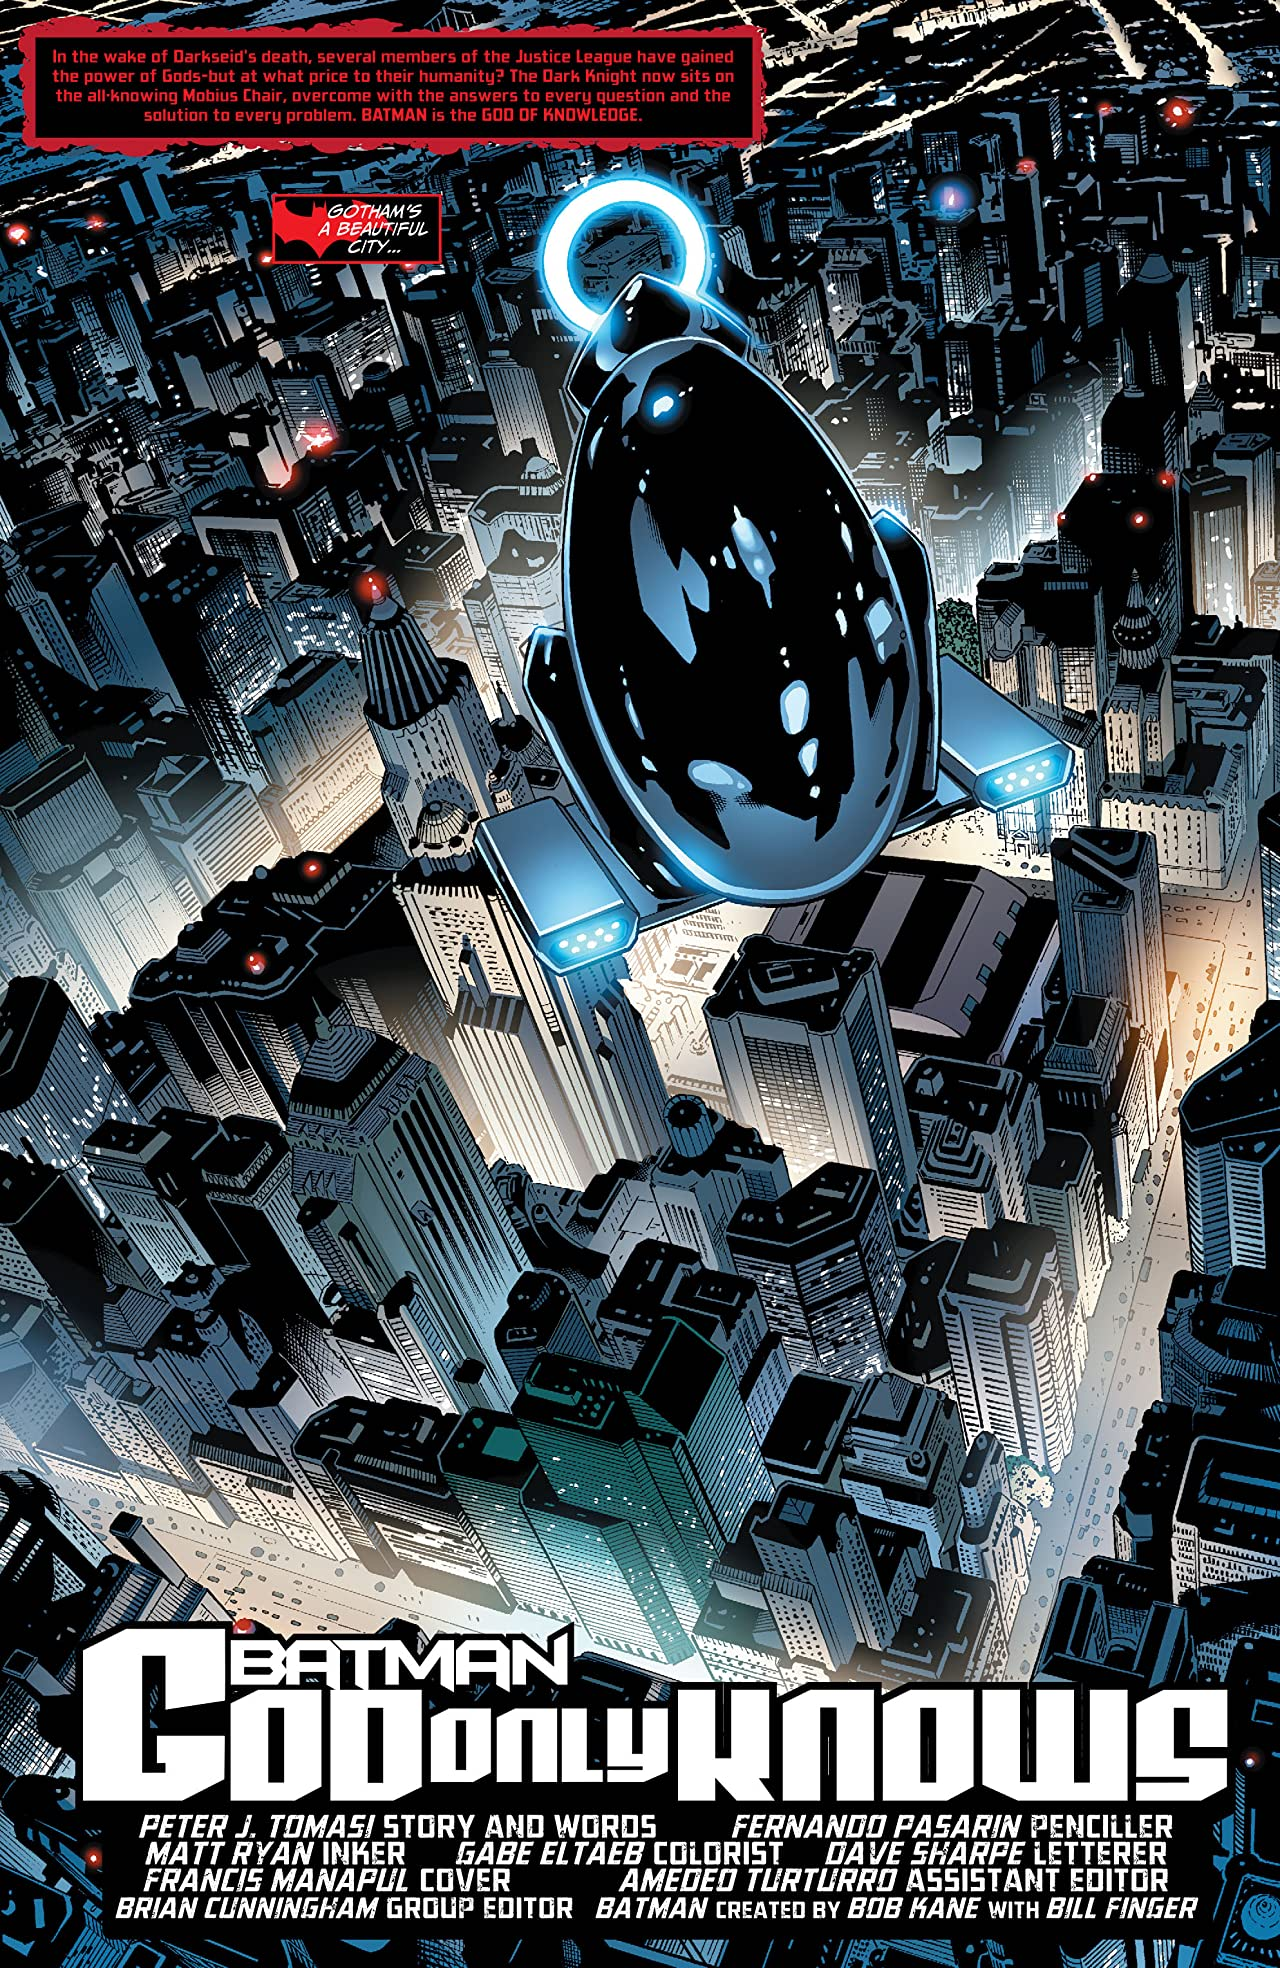 Justice League: The Darkseid War: Batman (2015) #1